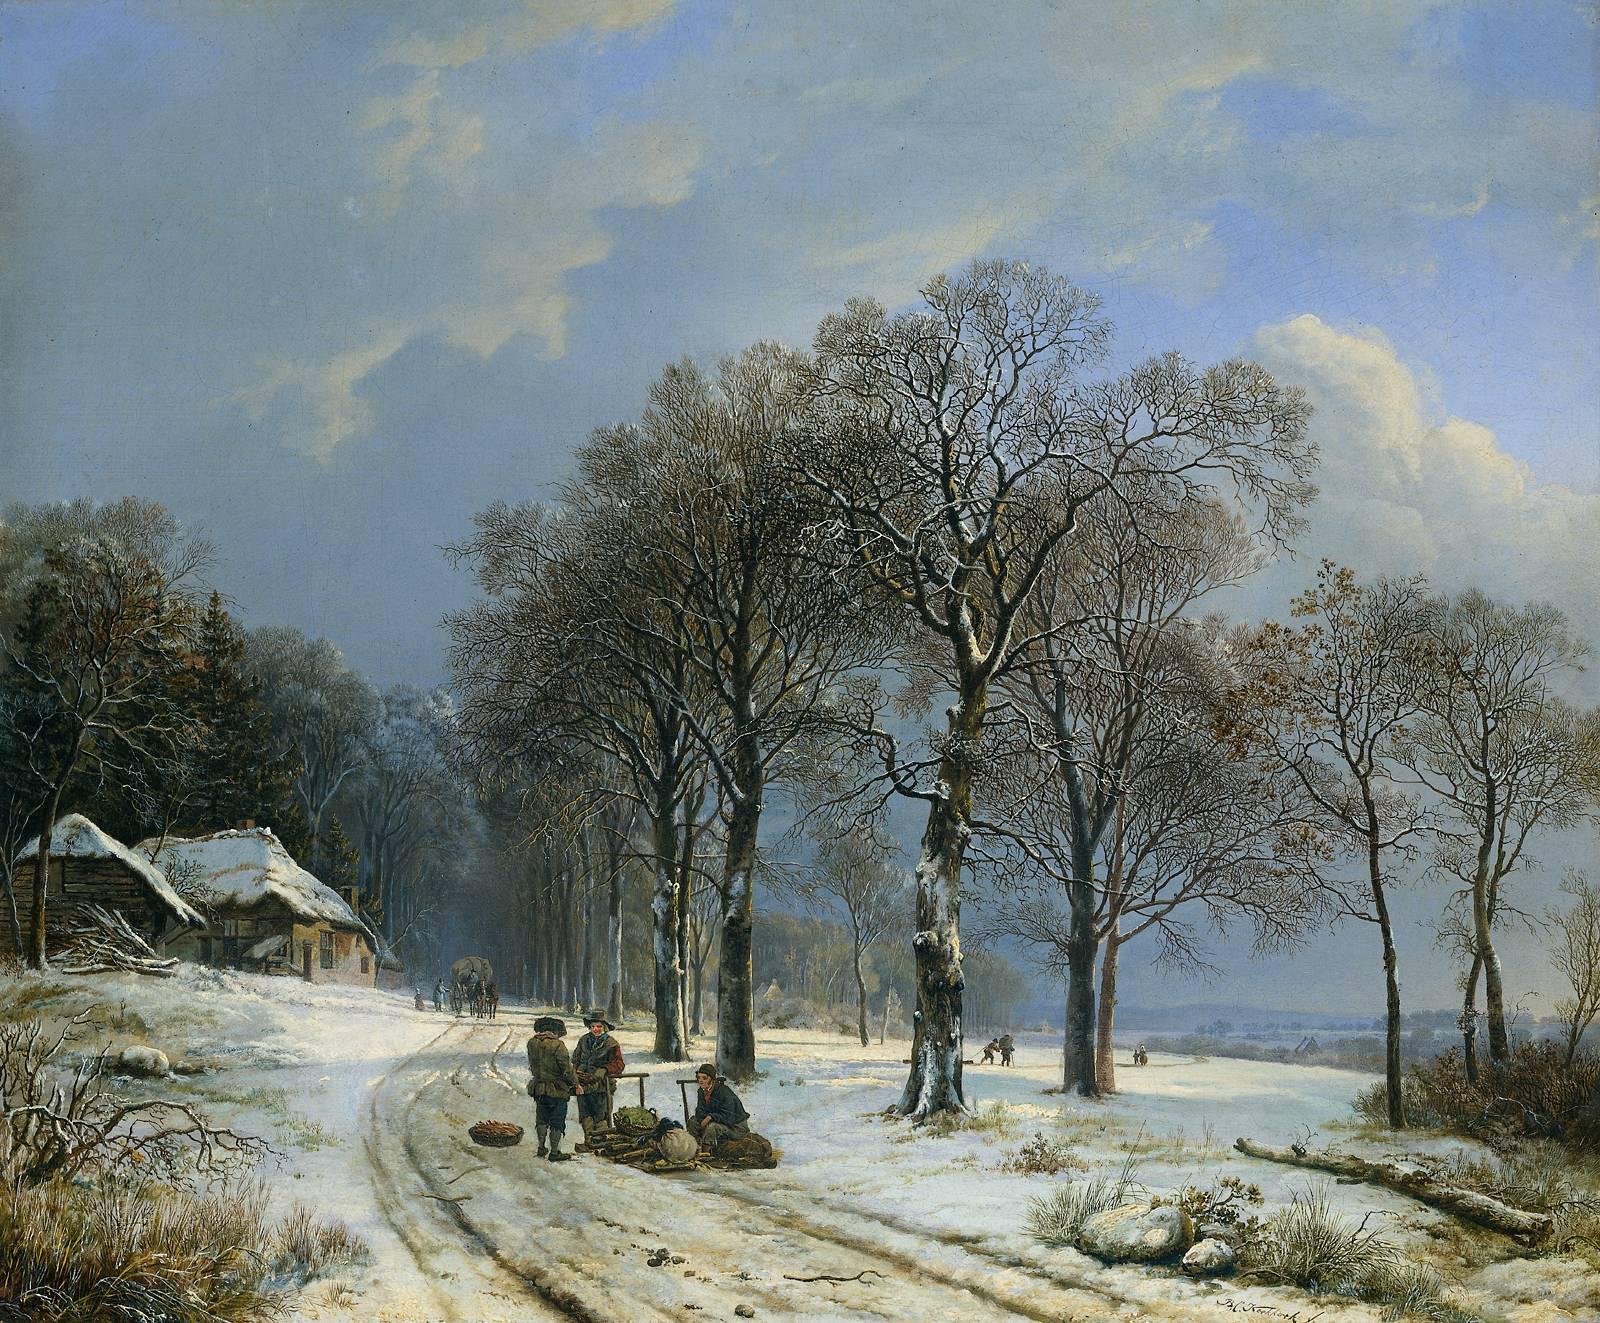 koekkoek_1838_snowscape